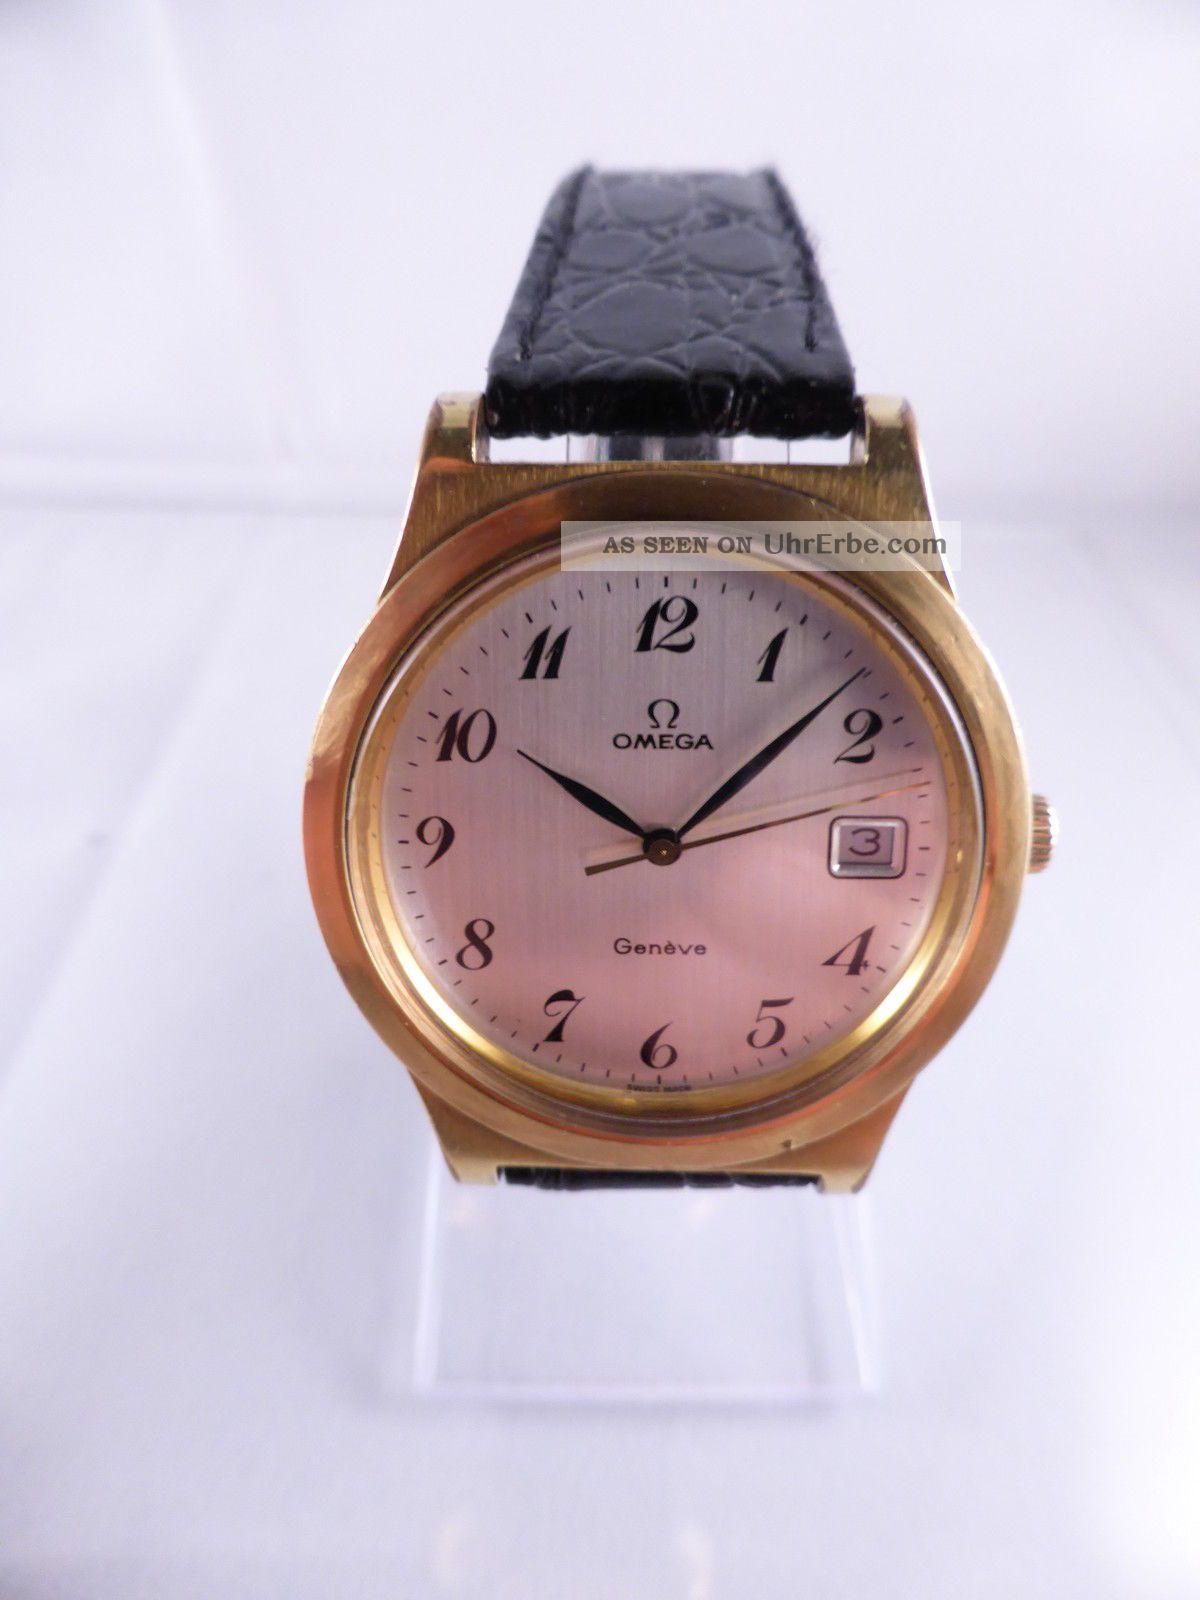 Omega Geneve Luxusuhr Mit Kaliber 1030,  Handaufzug,  Datum Ca.  1974,  Vintage - Uhr Armbanduhren Bild